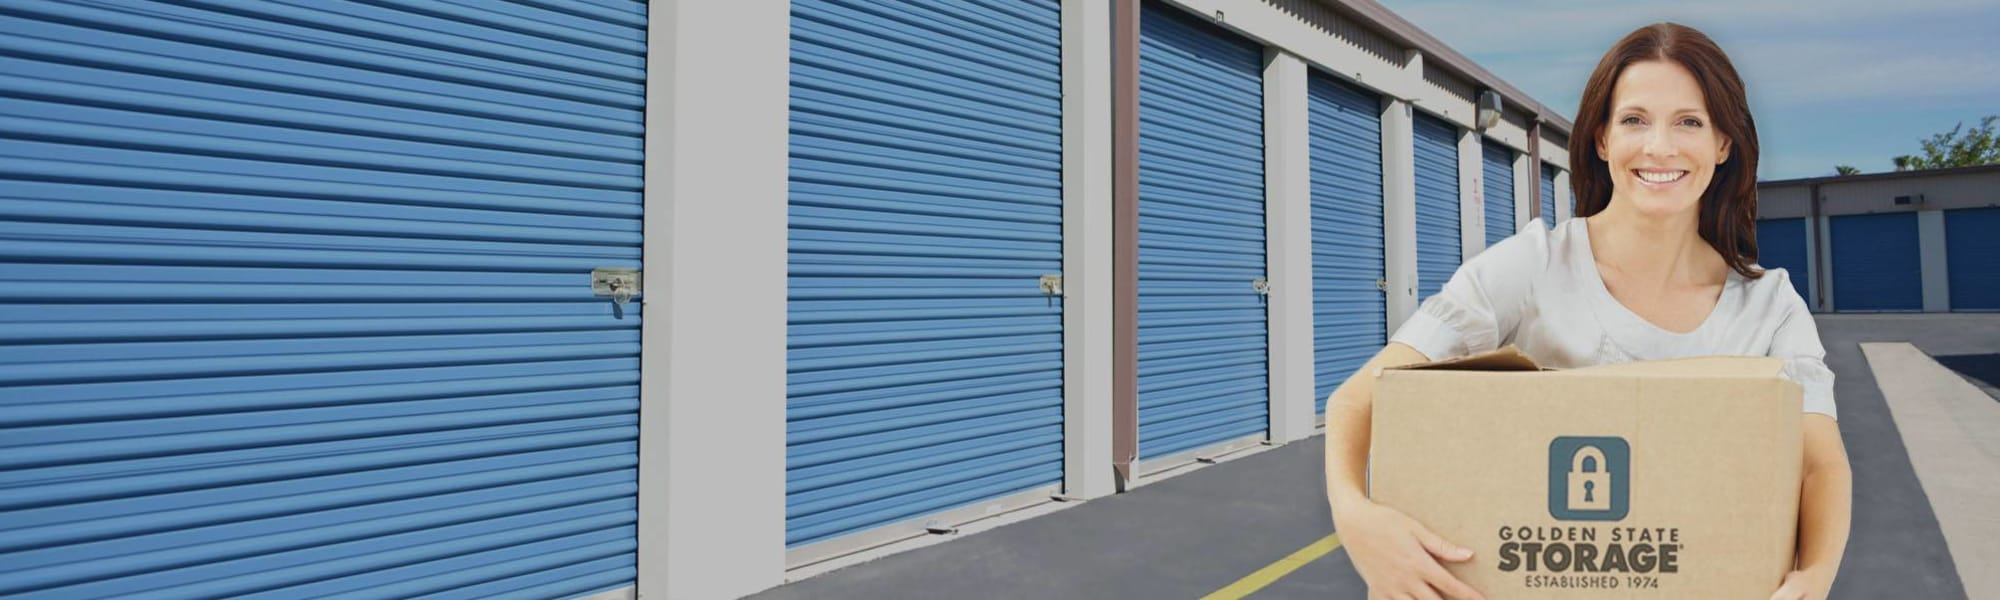 Reviews of Golden State Storage - Northridge in Northridge, California